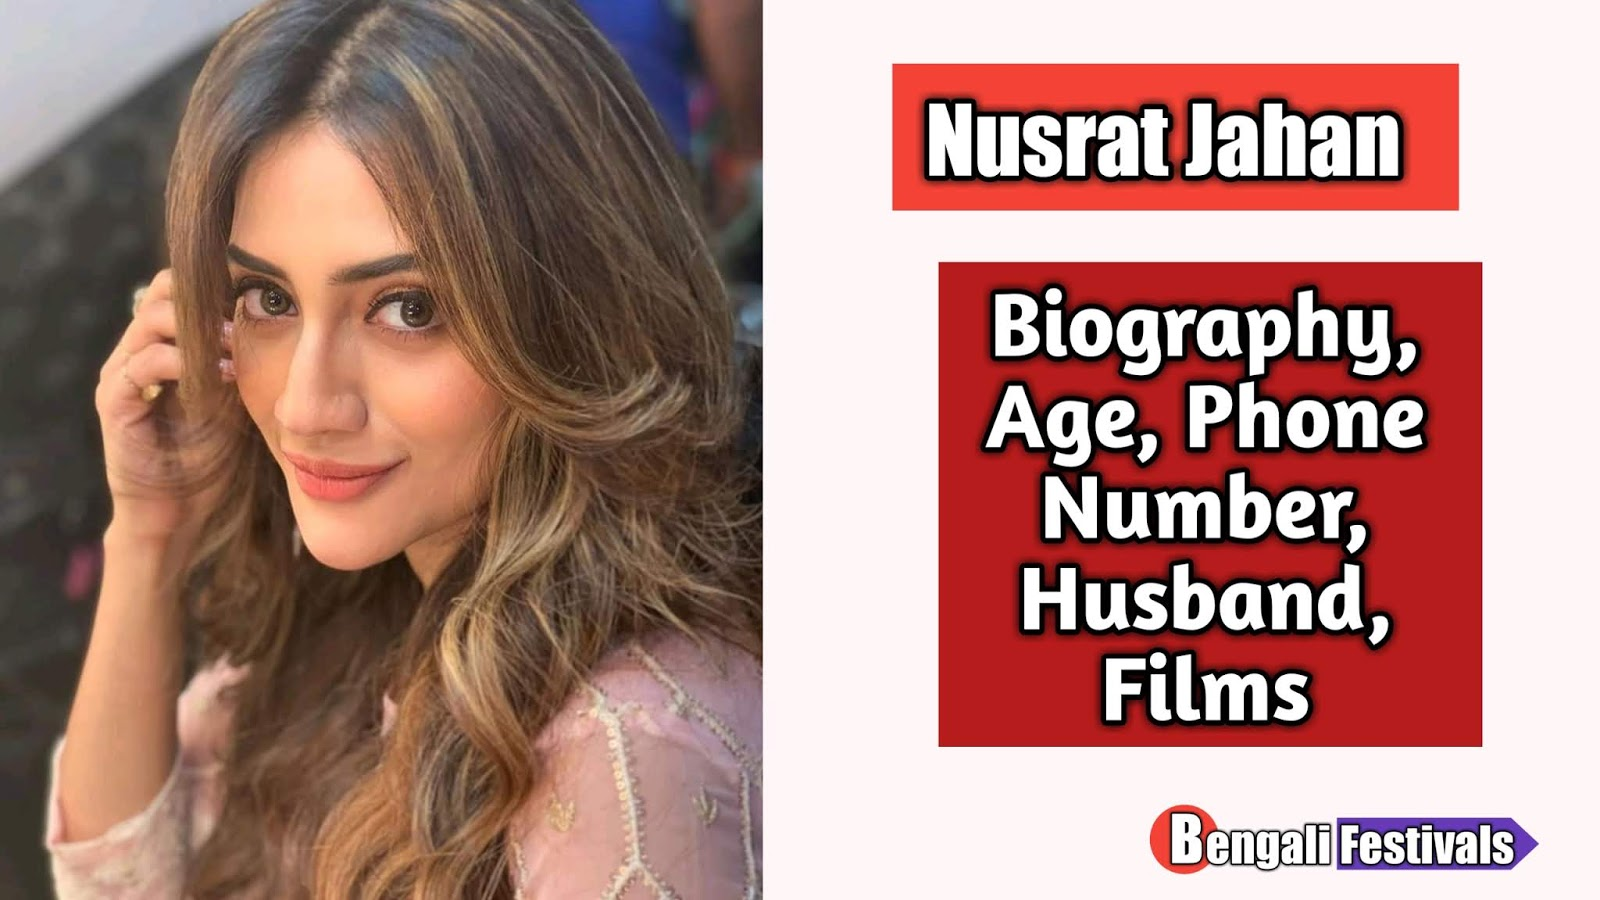 Nusrat Jahan